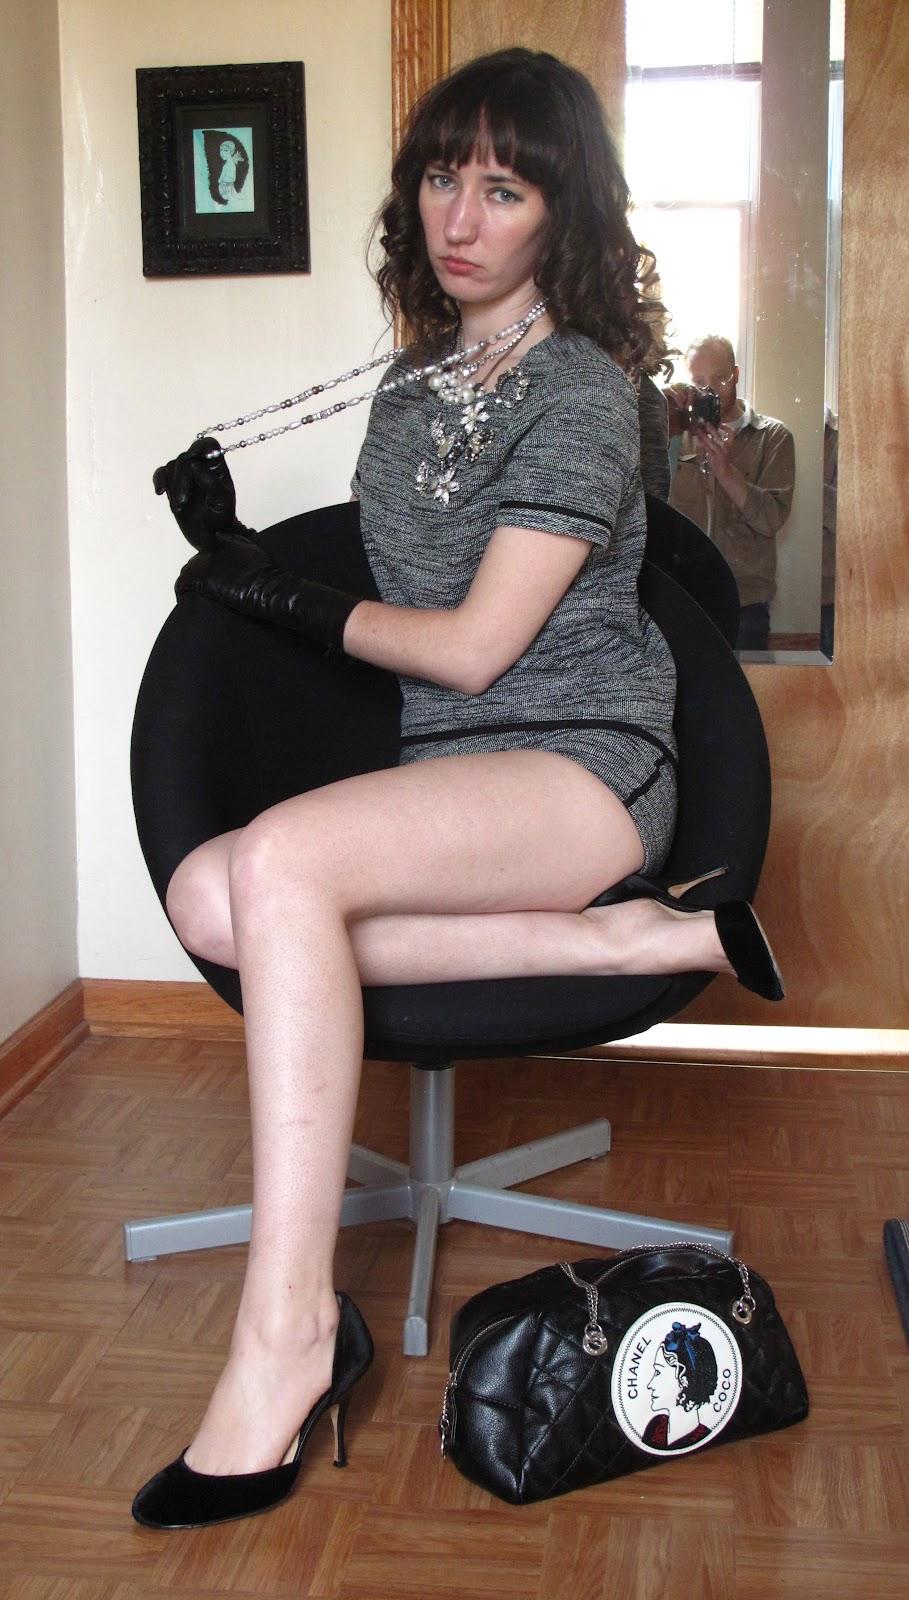 bøsse erotic massage norway hårete pikkr